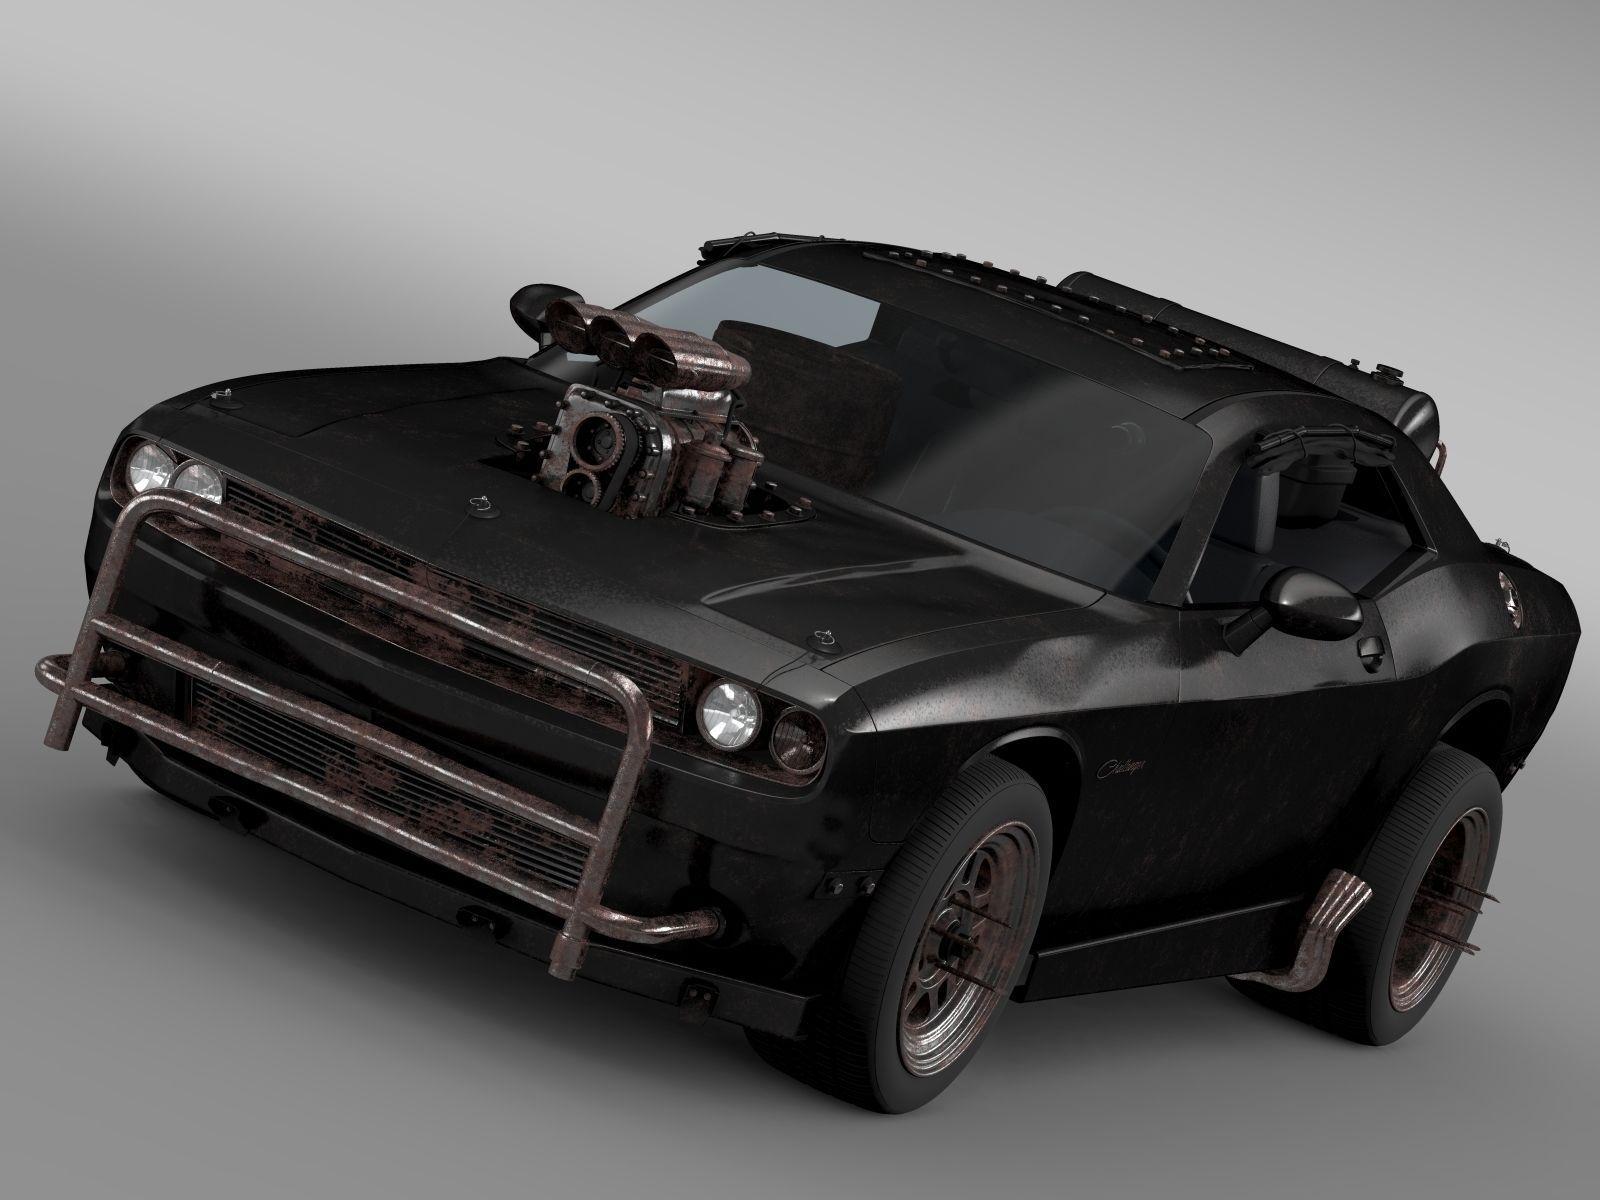 Mad Max Fight Interceptor Dodge Challenger 2015 3d Model Max Obj 3ds Fbx  C4d Lwo Lw ...